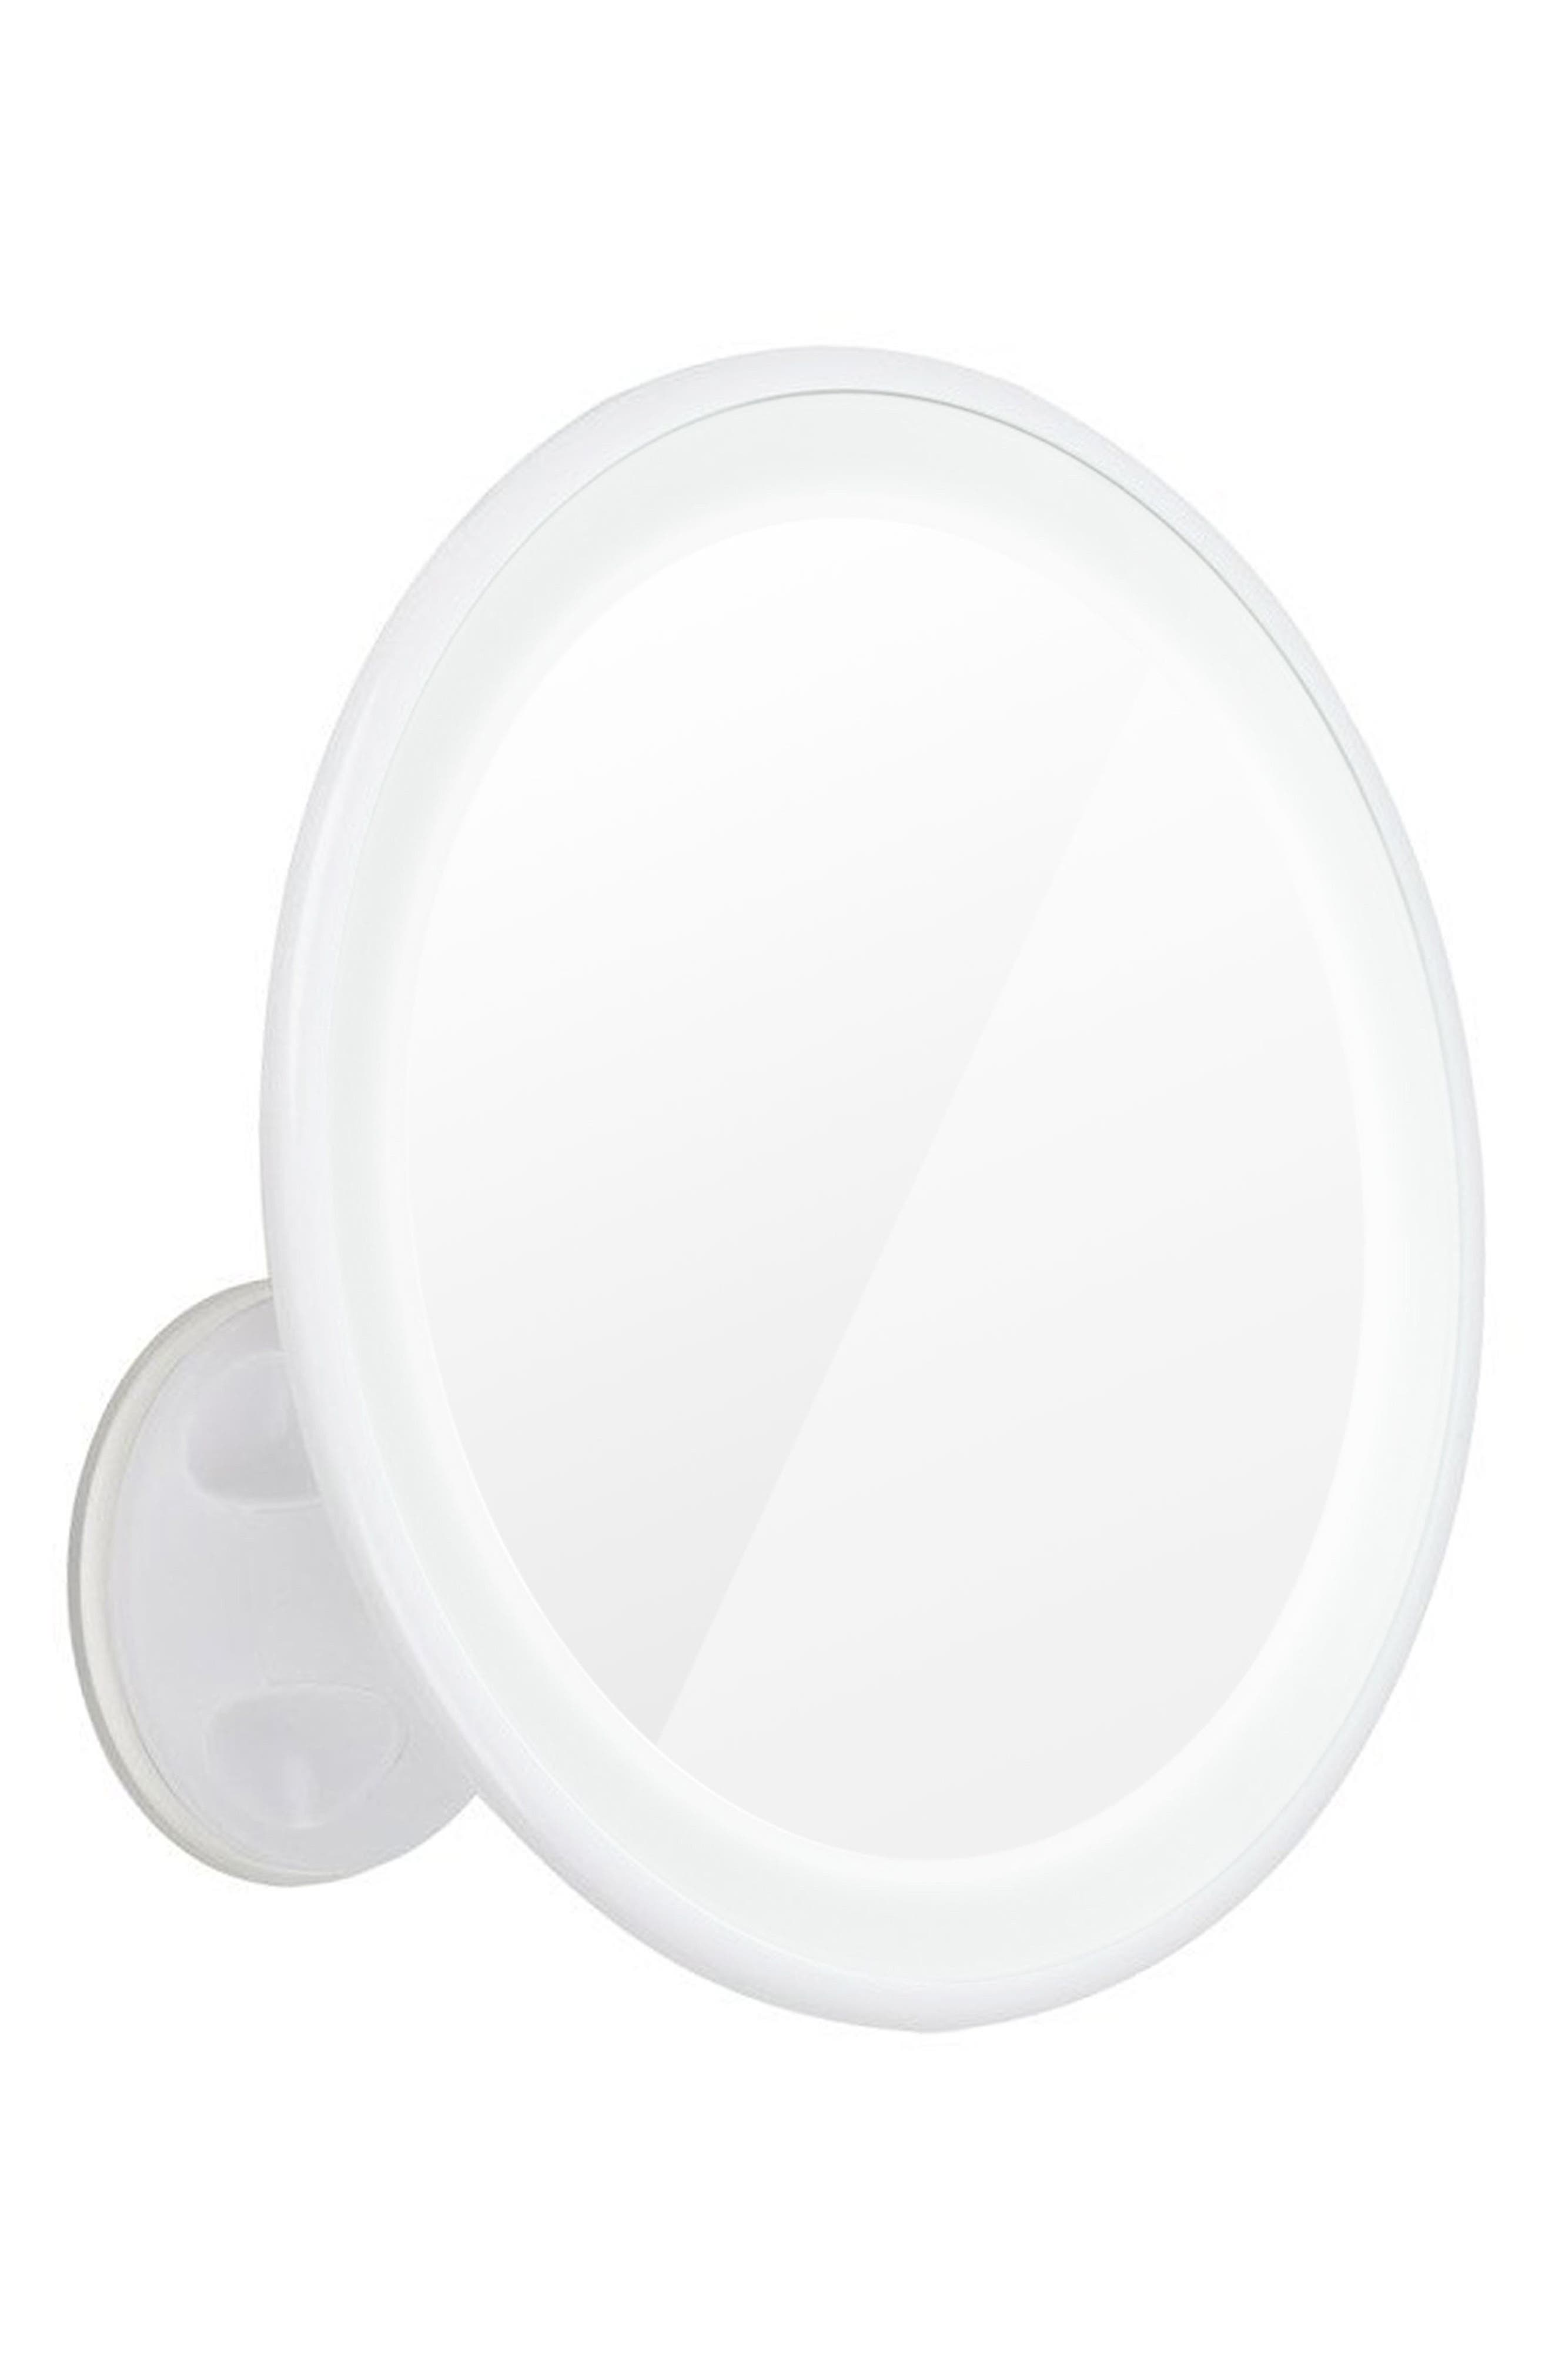 Impressions Vanity Co. Halo LED 5x Wall Mirror